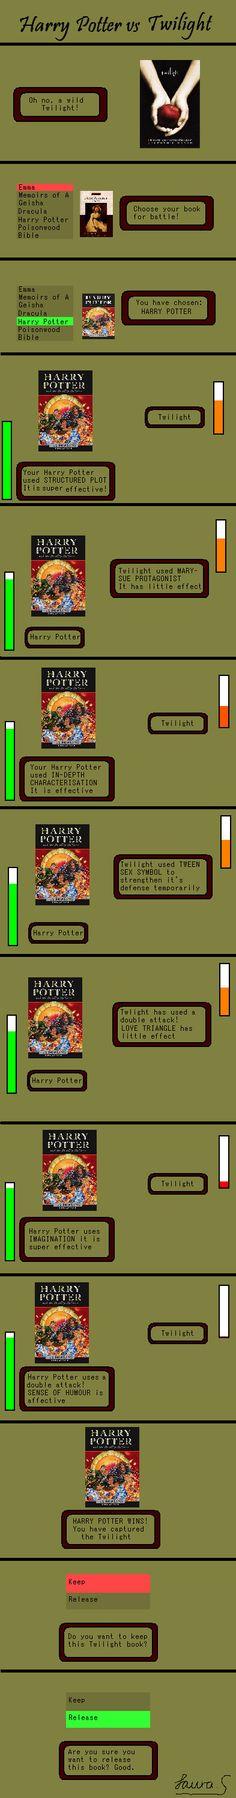 Harry Potter vs Twilight by OuranHarryPotterfan9 on deviantART